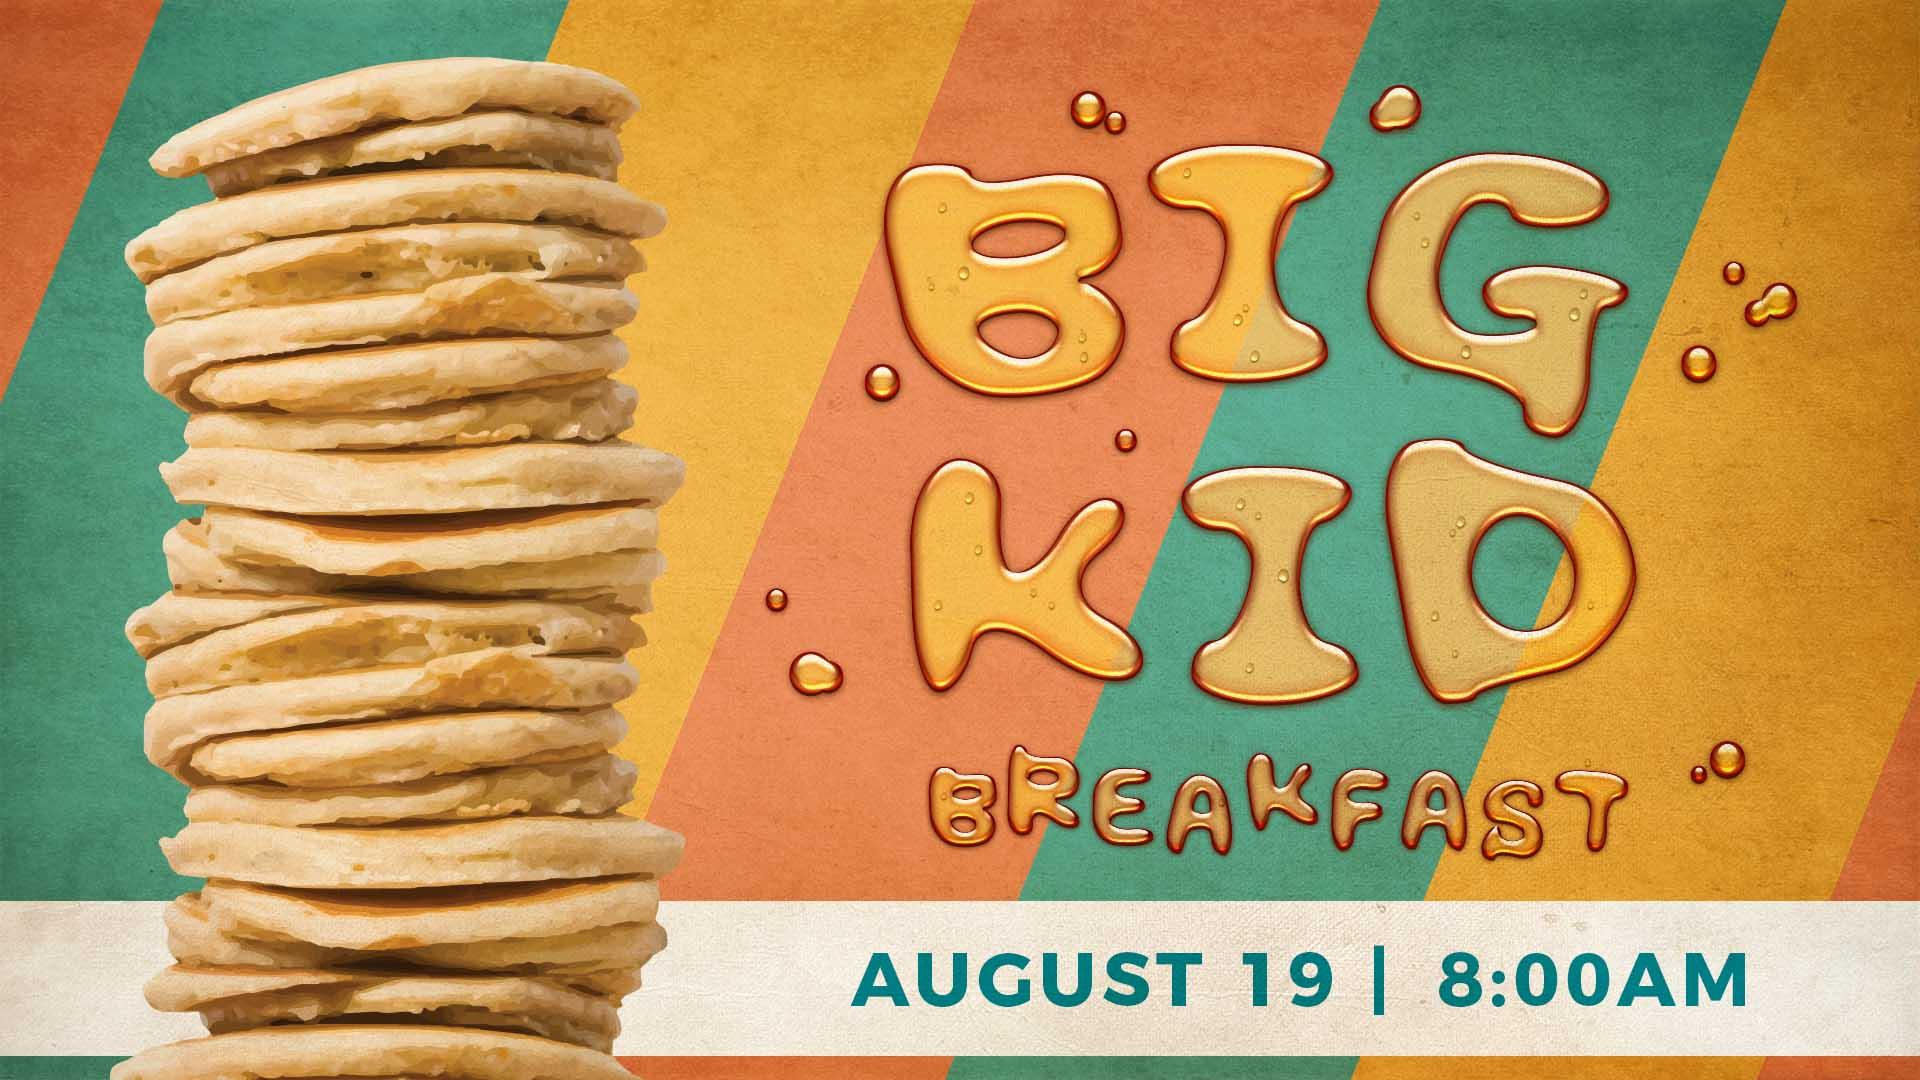 Big kid breakfast slide